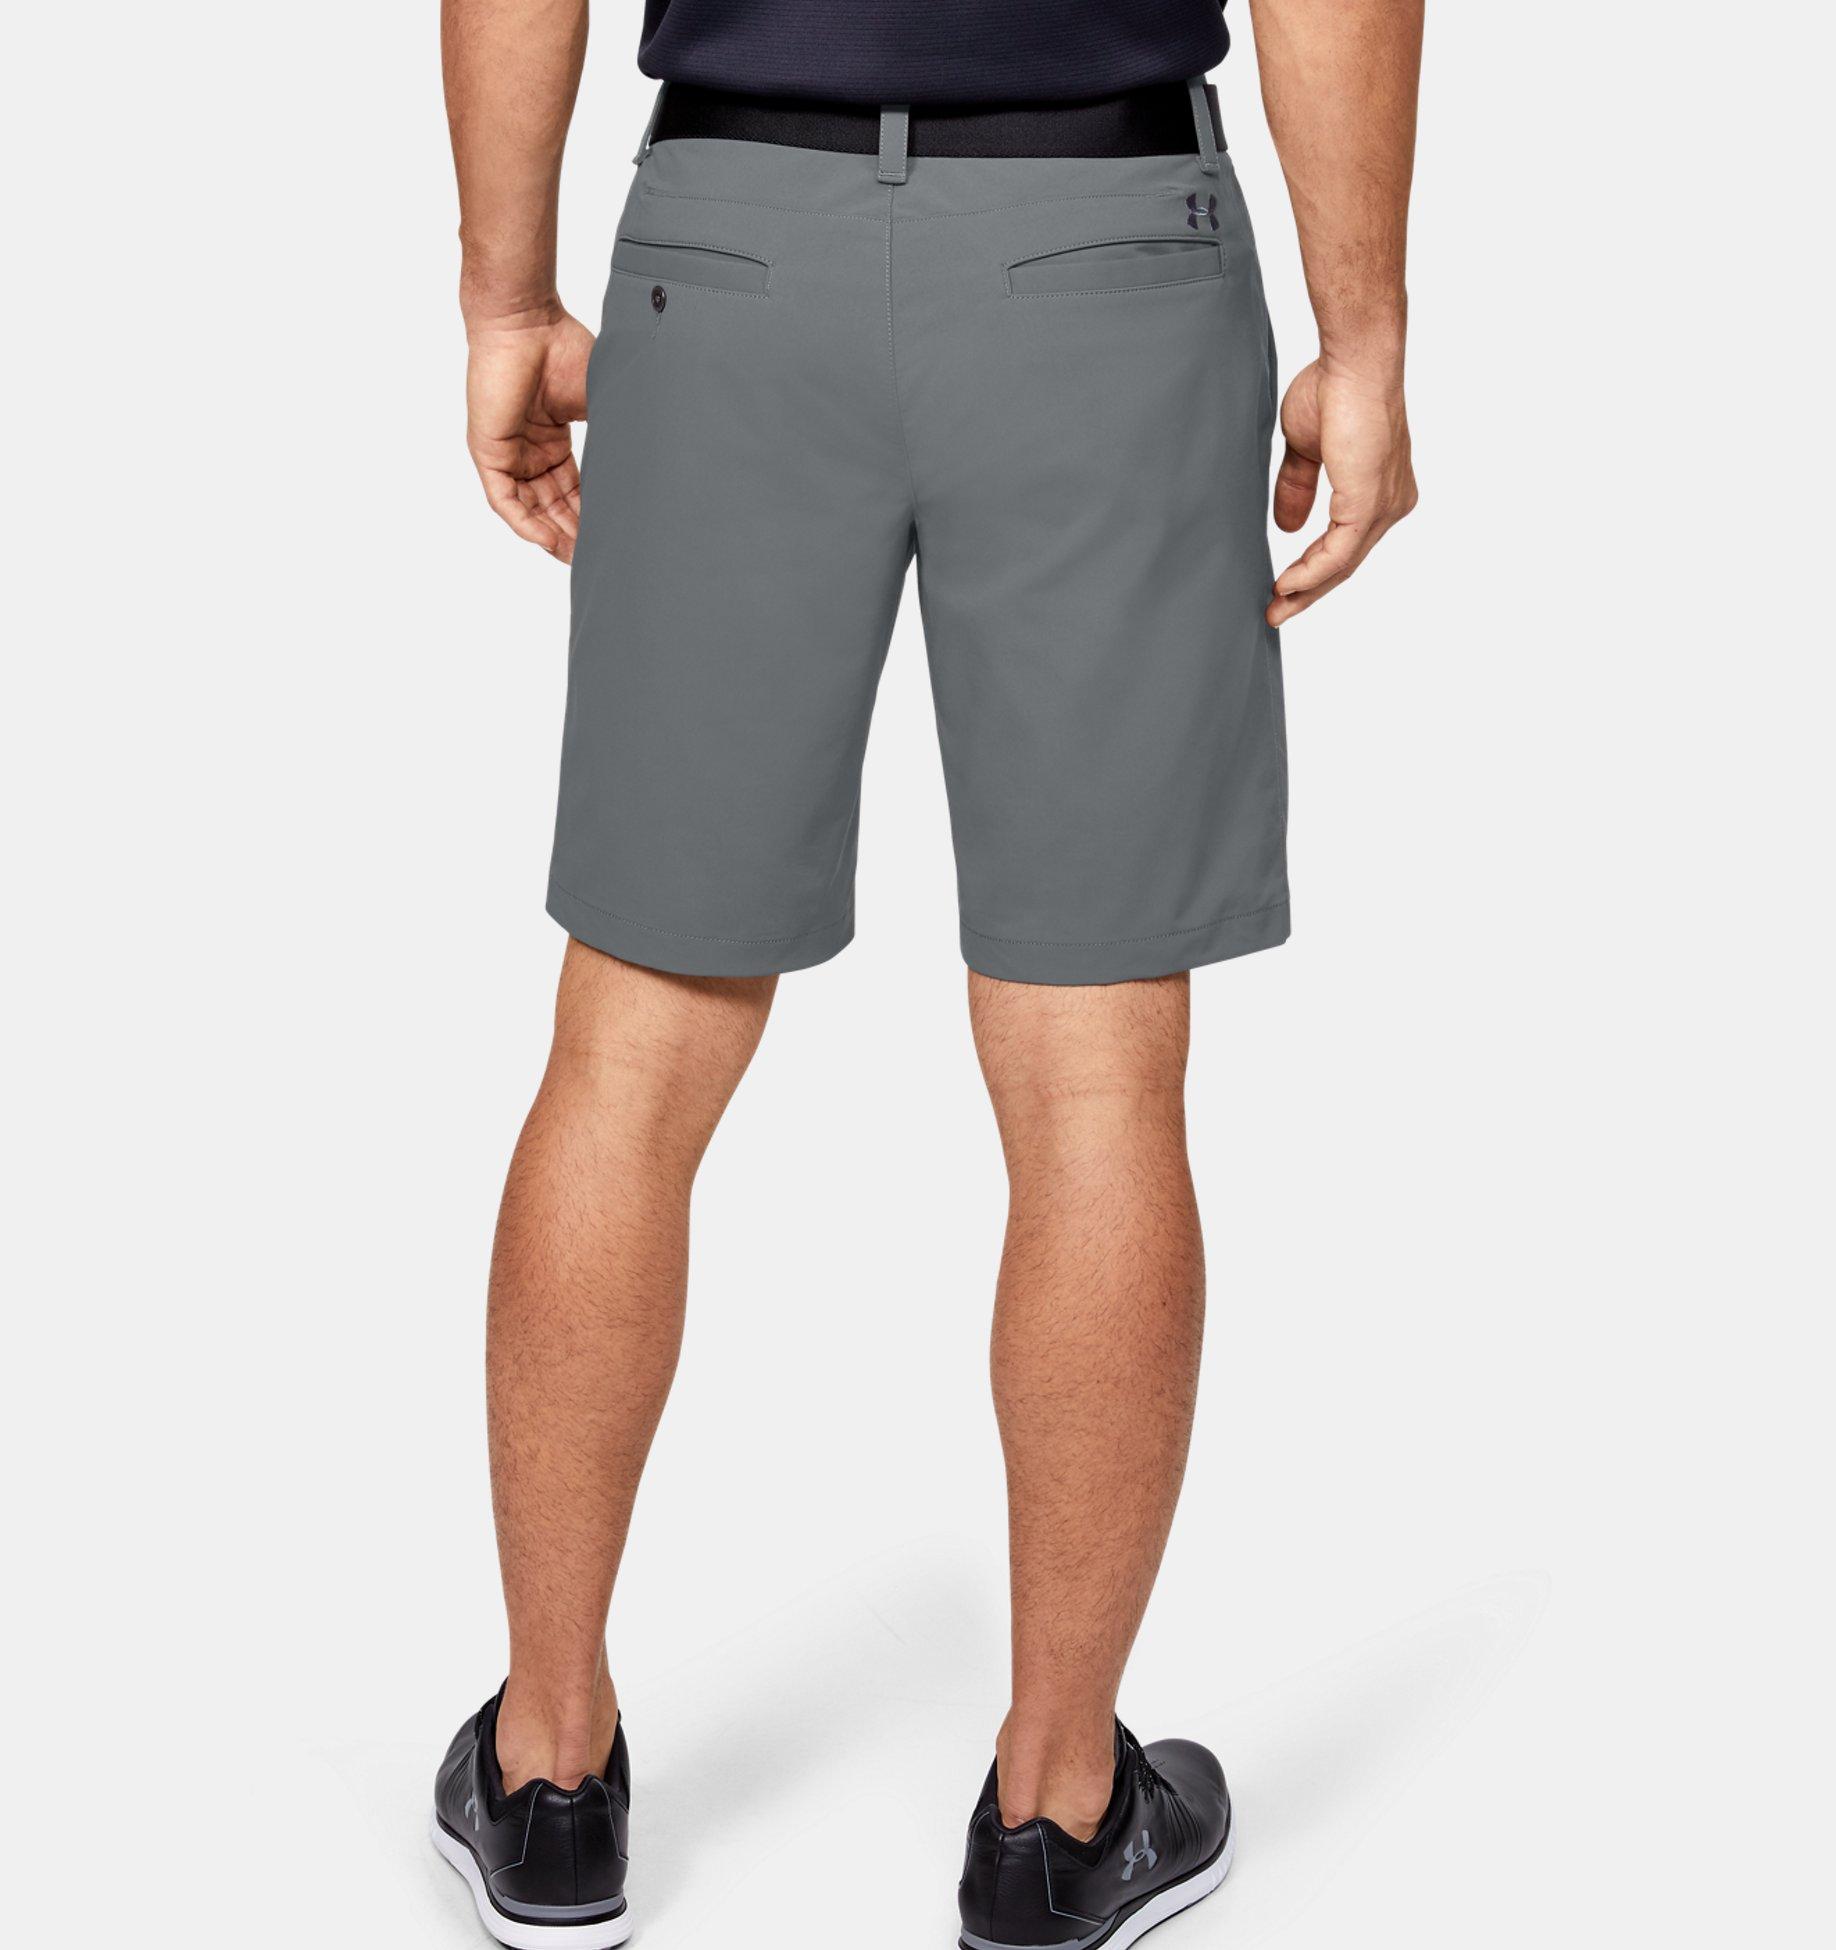 Men S Ua Match Play Shorts Under Armour,Storage Bench Walmart Canada